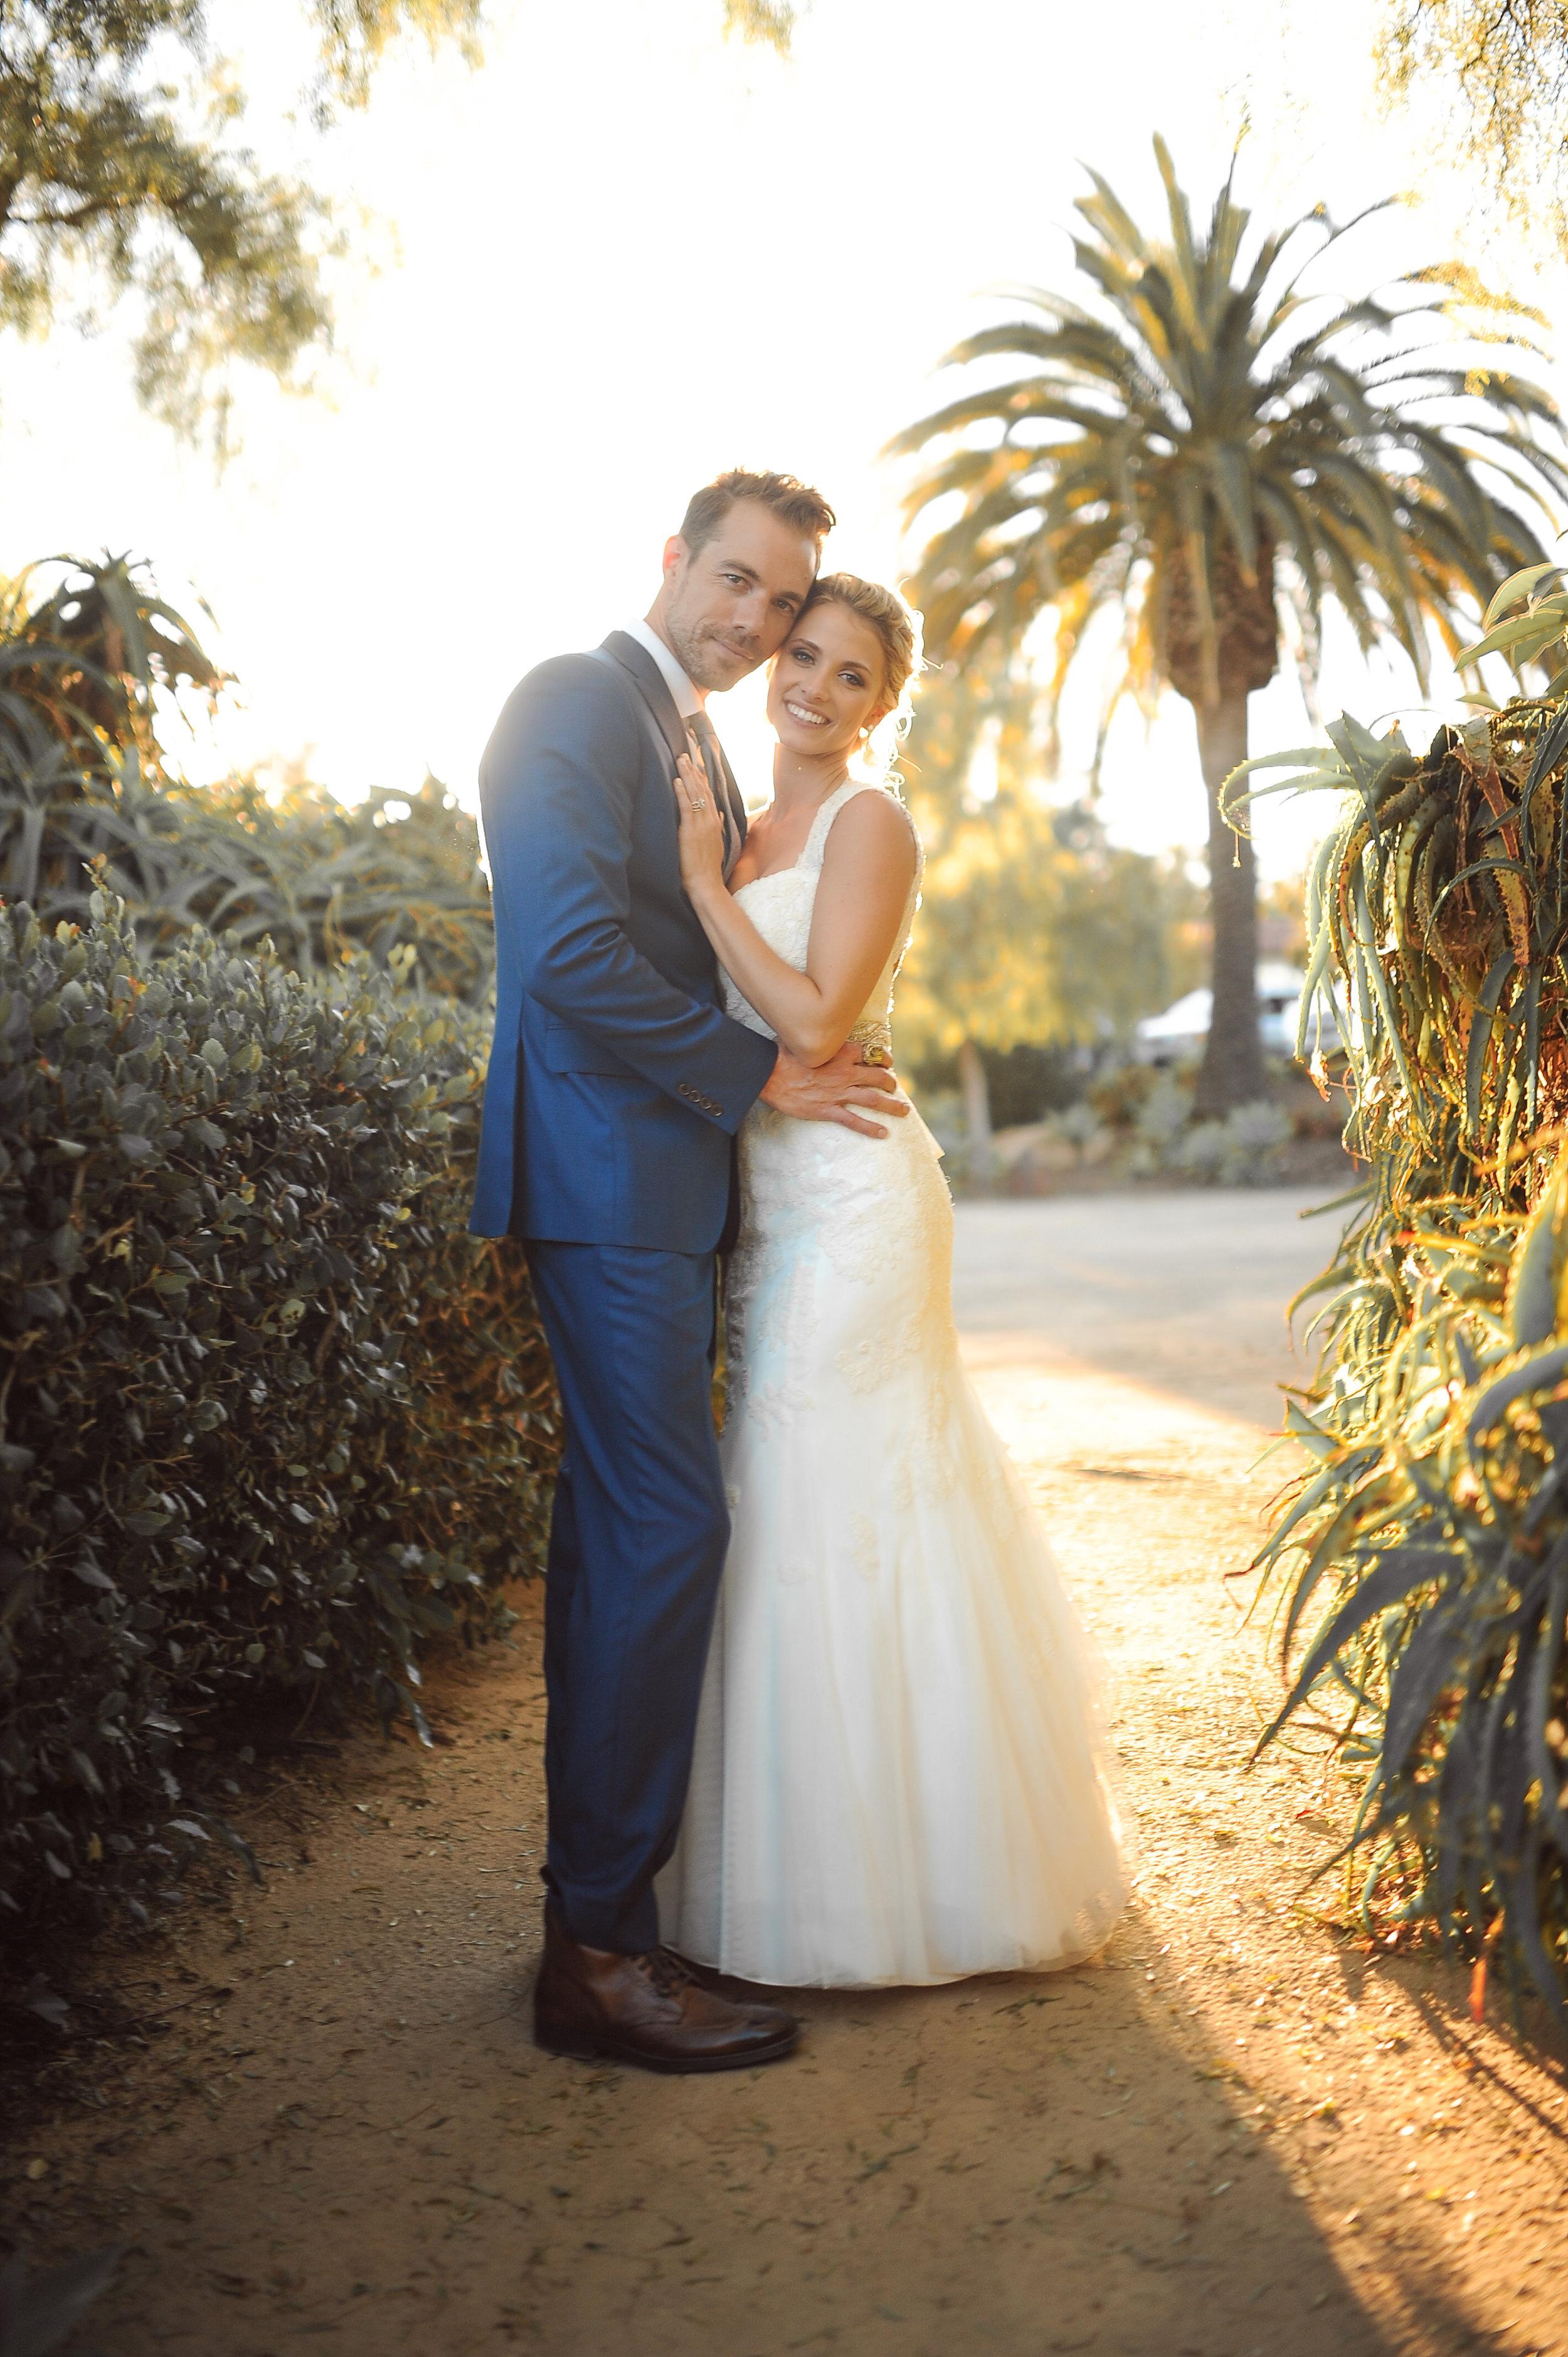 www.santabarbarawedding.com | JKoe Photography | Santa Barbara Historical Museum | Bride and Groom